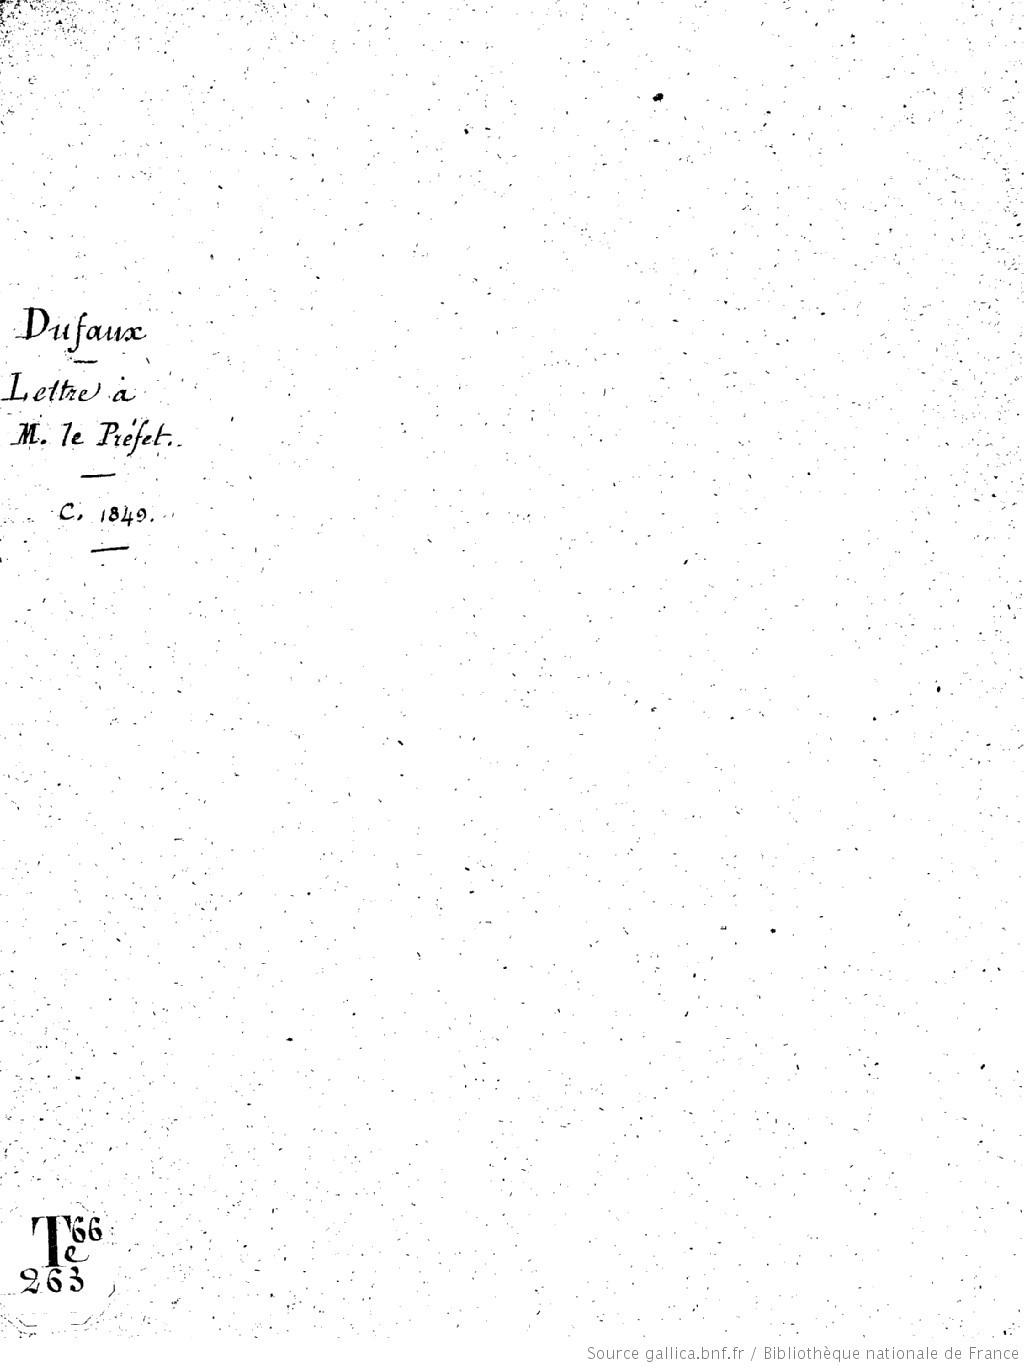 http://gallica.bnf.fr/ark:/12148/bpt6k6123701r.thumbnail.highres.jpg